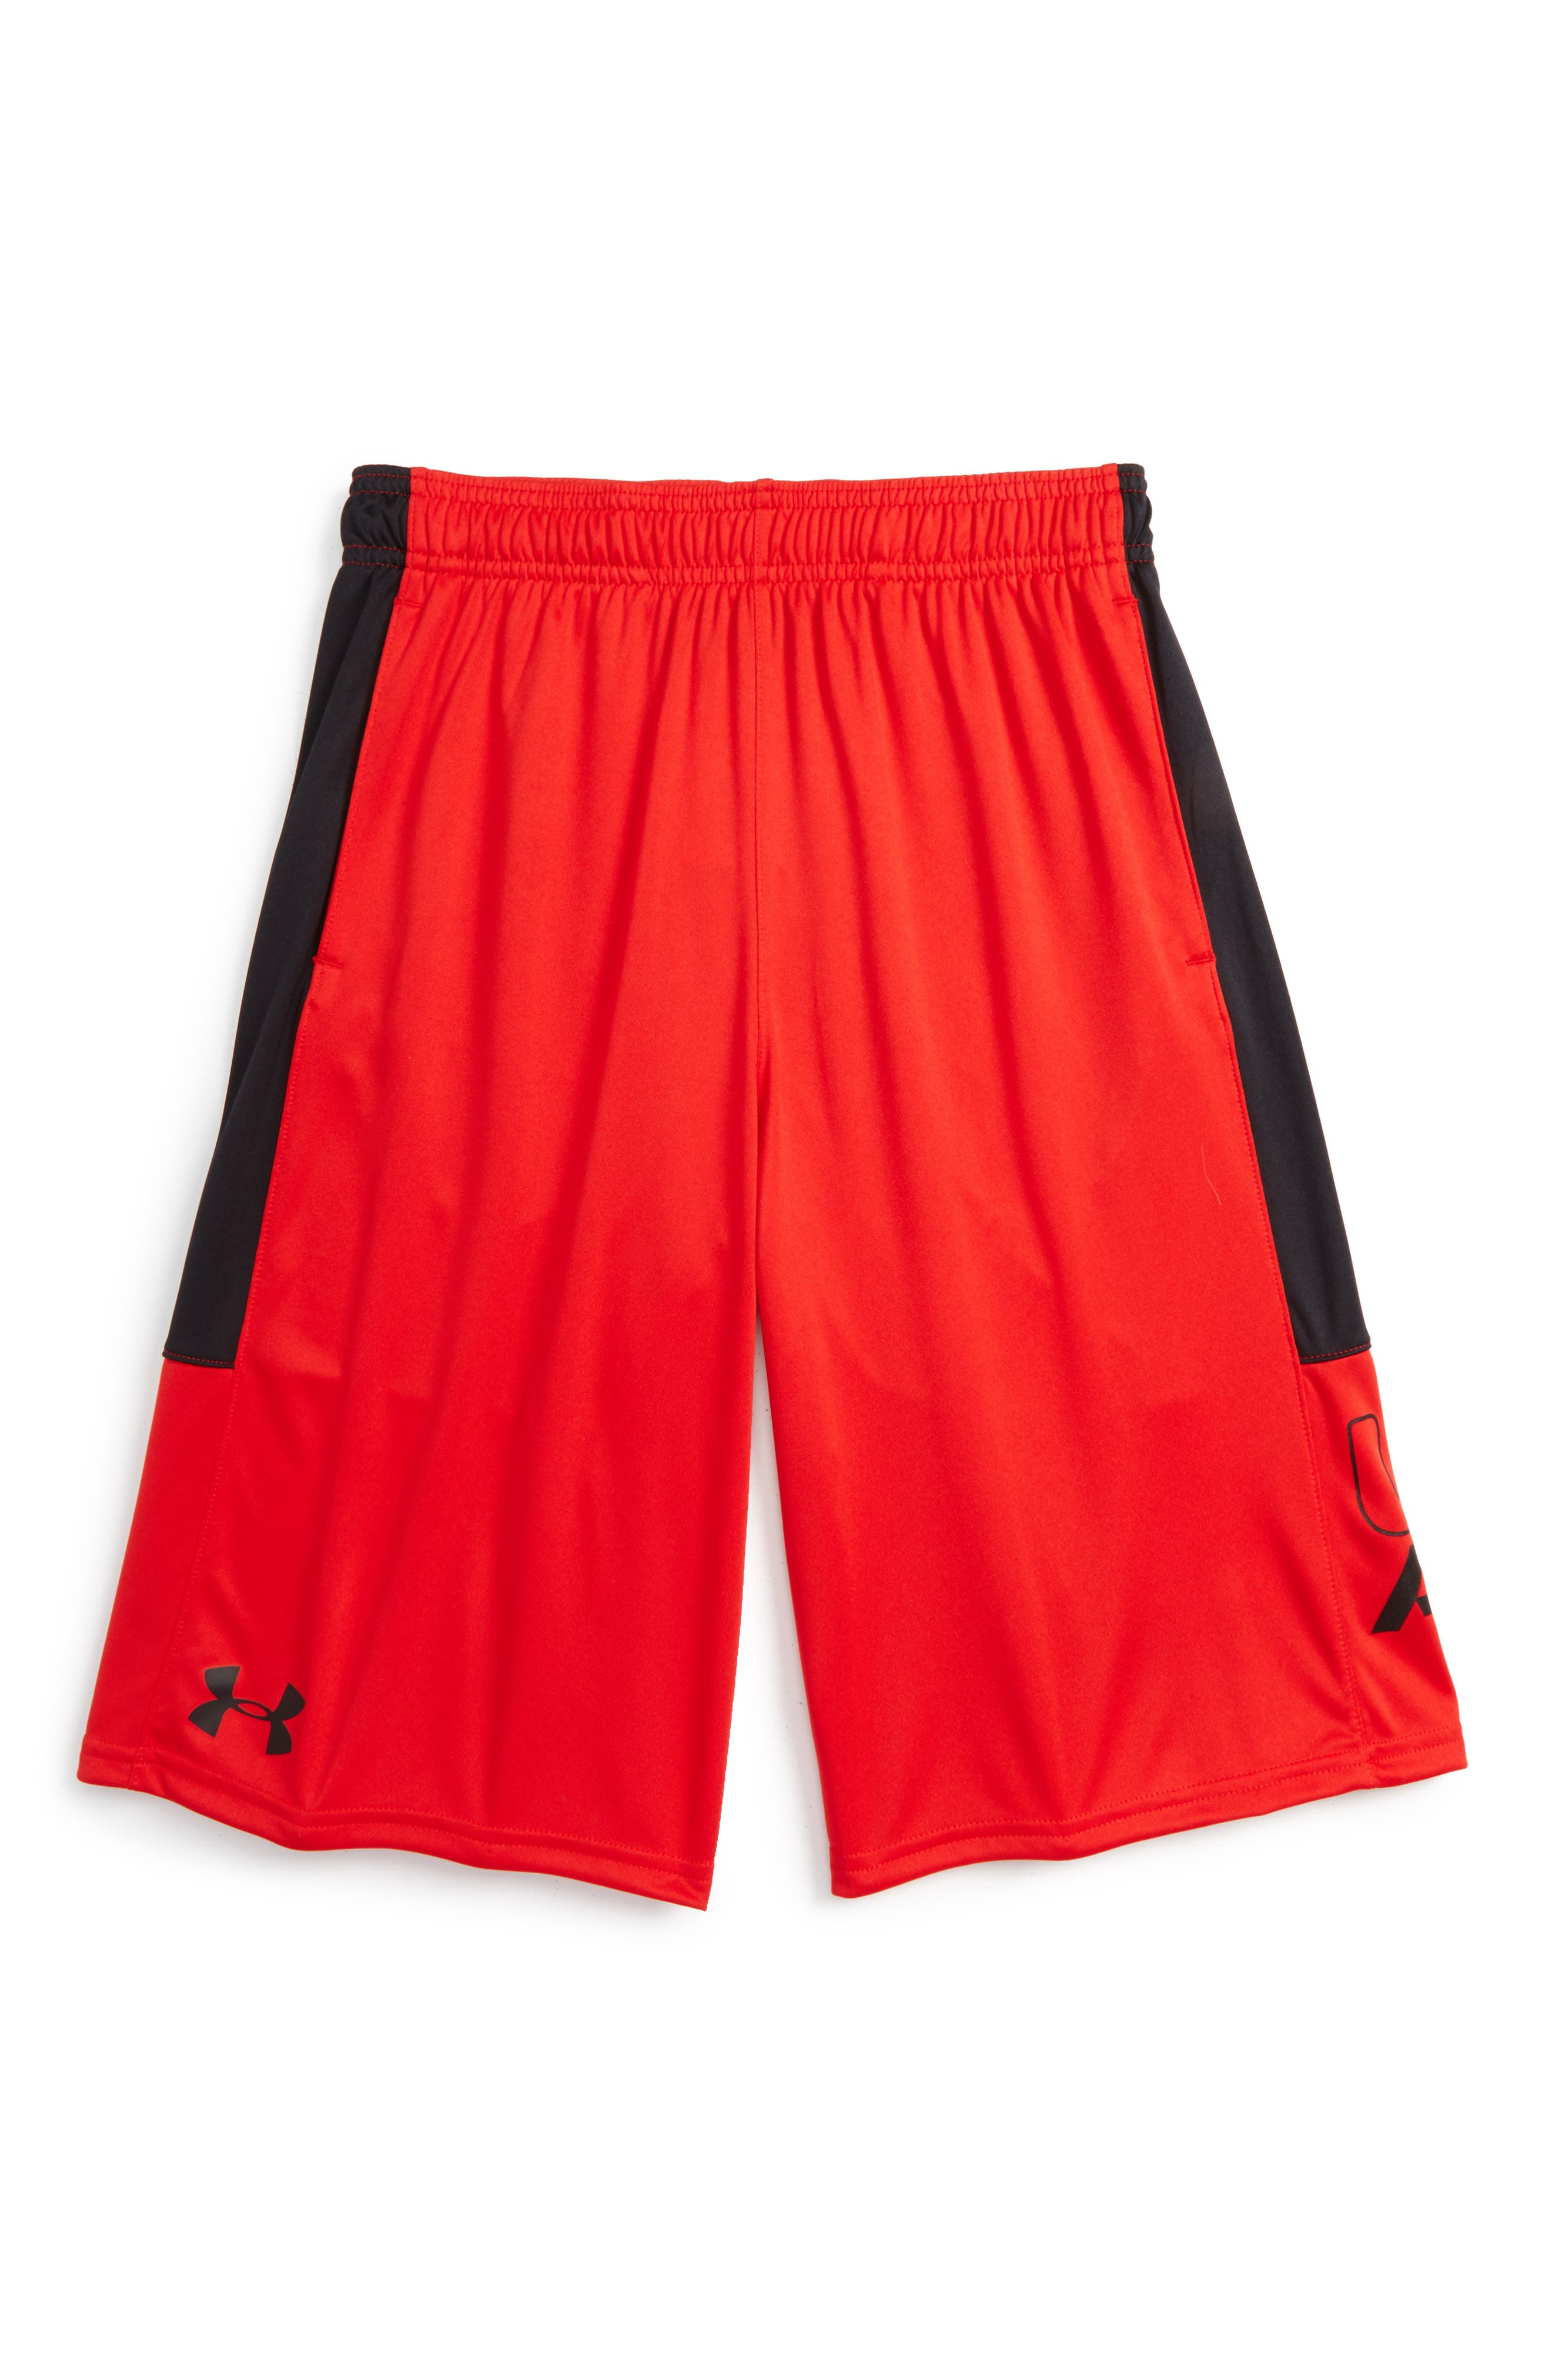 Stunt HeatGear<sup>®</sup> Shorts,                         Main,                         color, Red/Black/Black